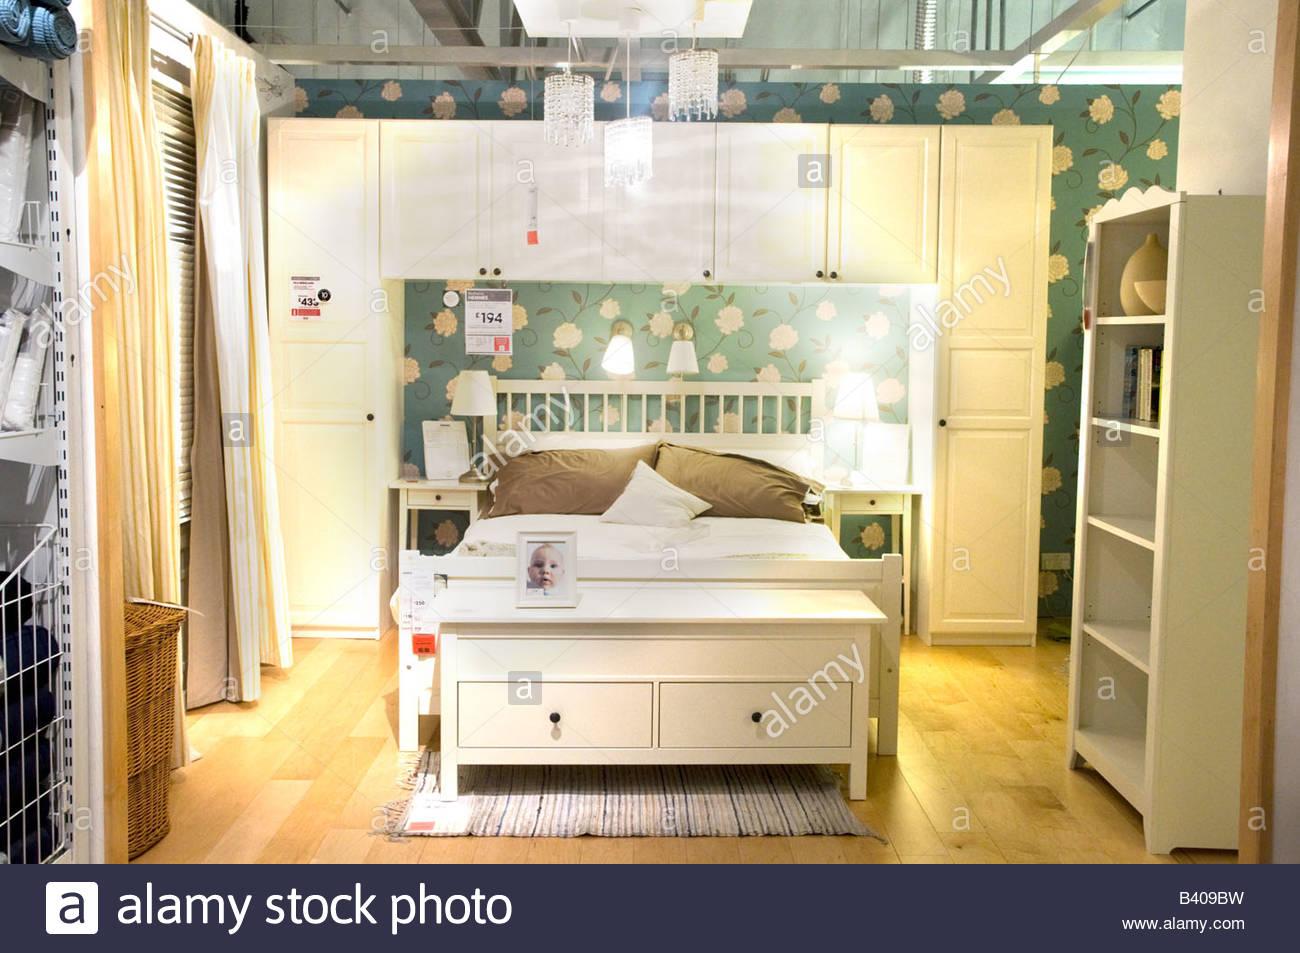 tottenham bedroom. Black Bedroom Furniture Sets. Home Design Ideas